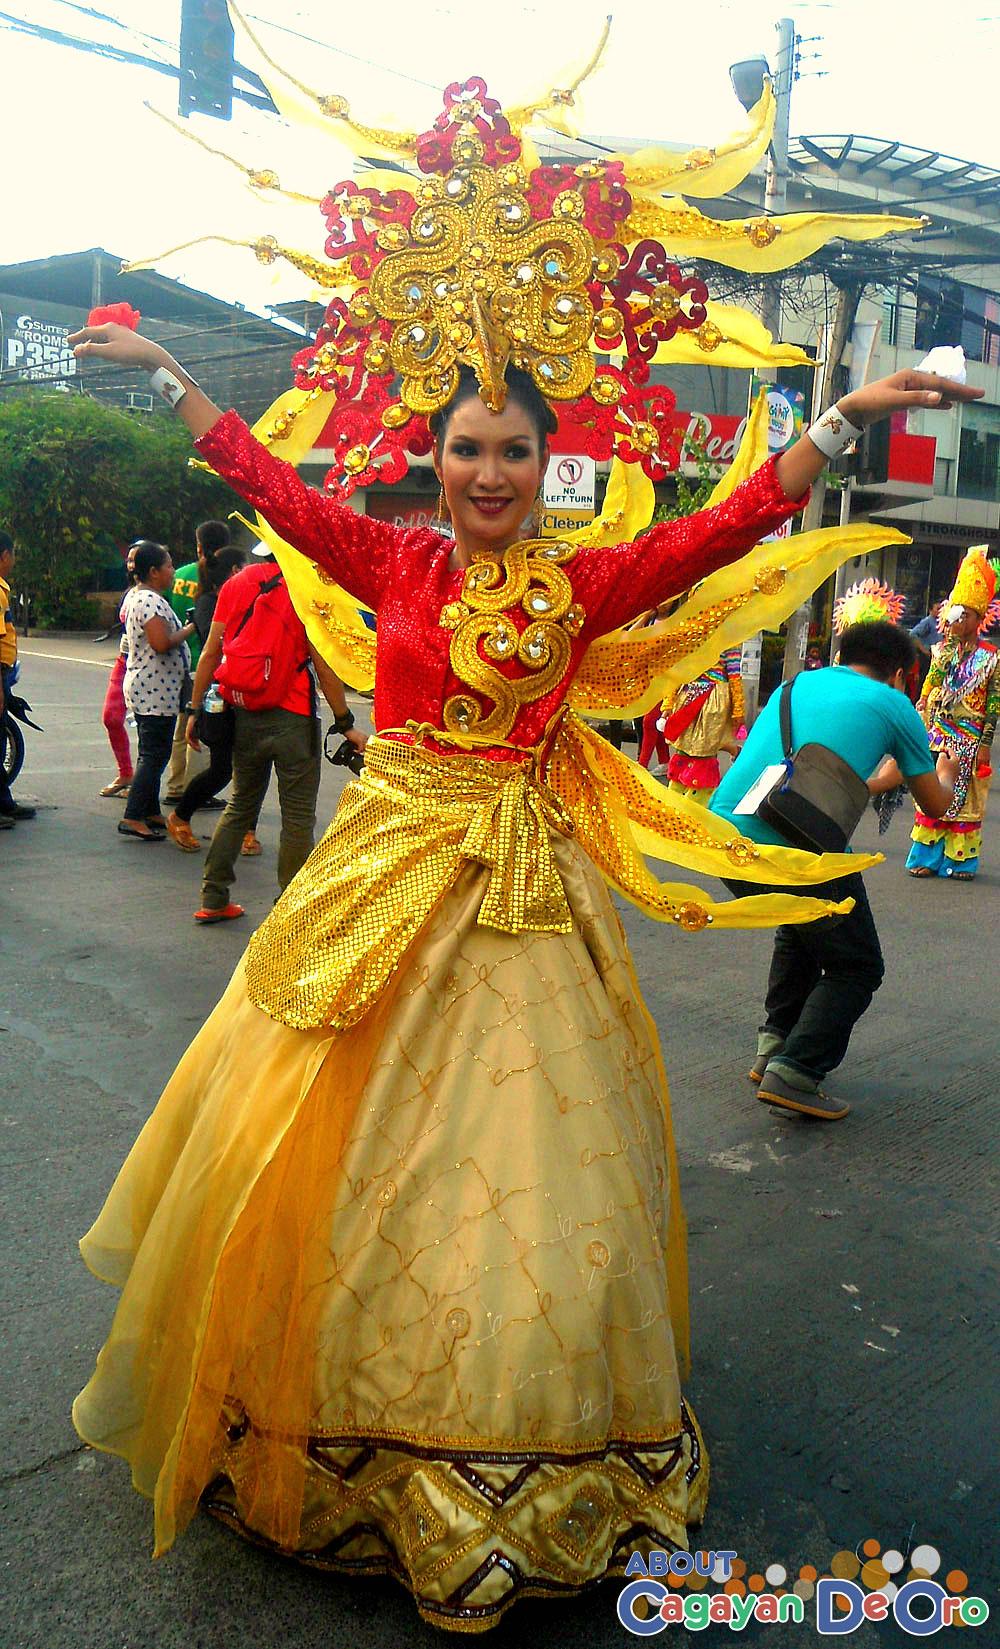 Macasandig National High School Carnival Queen - Cagayan de Oro Carnival Parade 2015